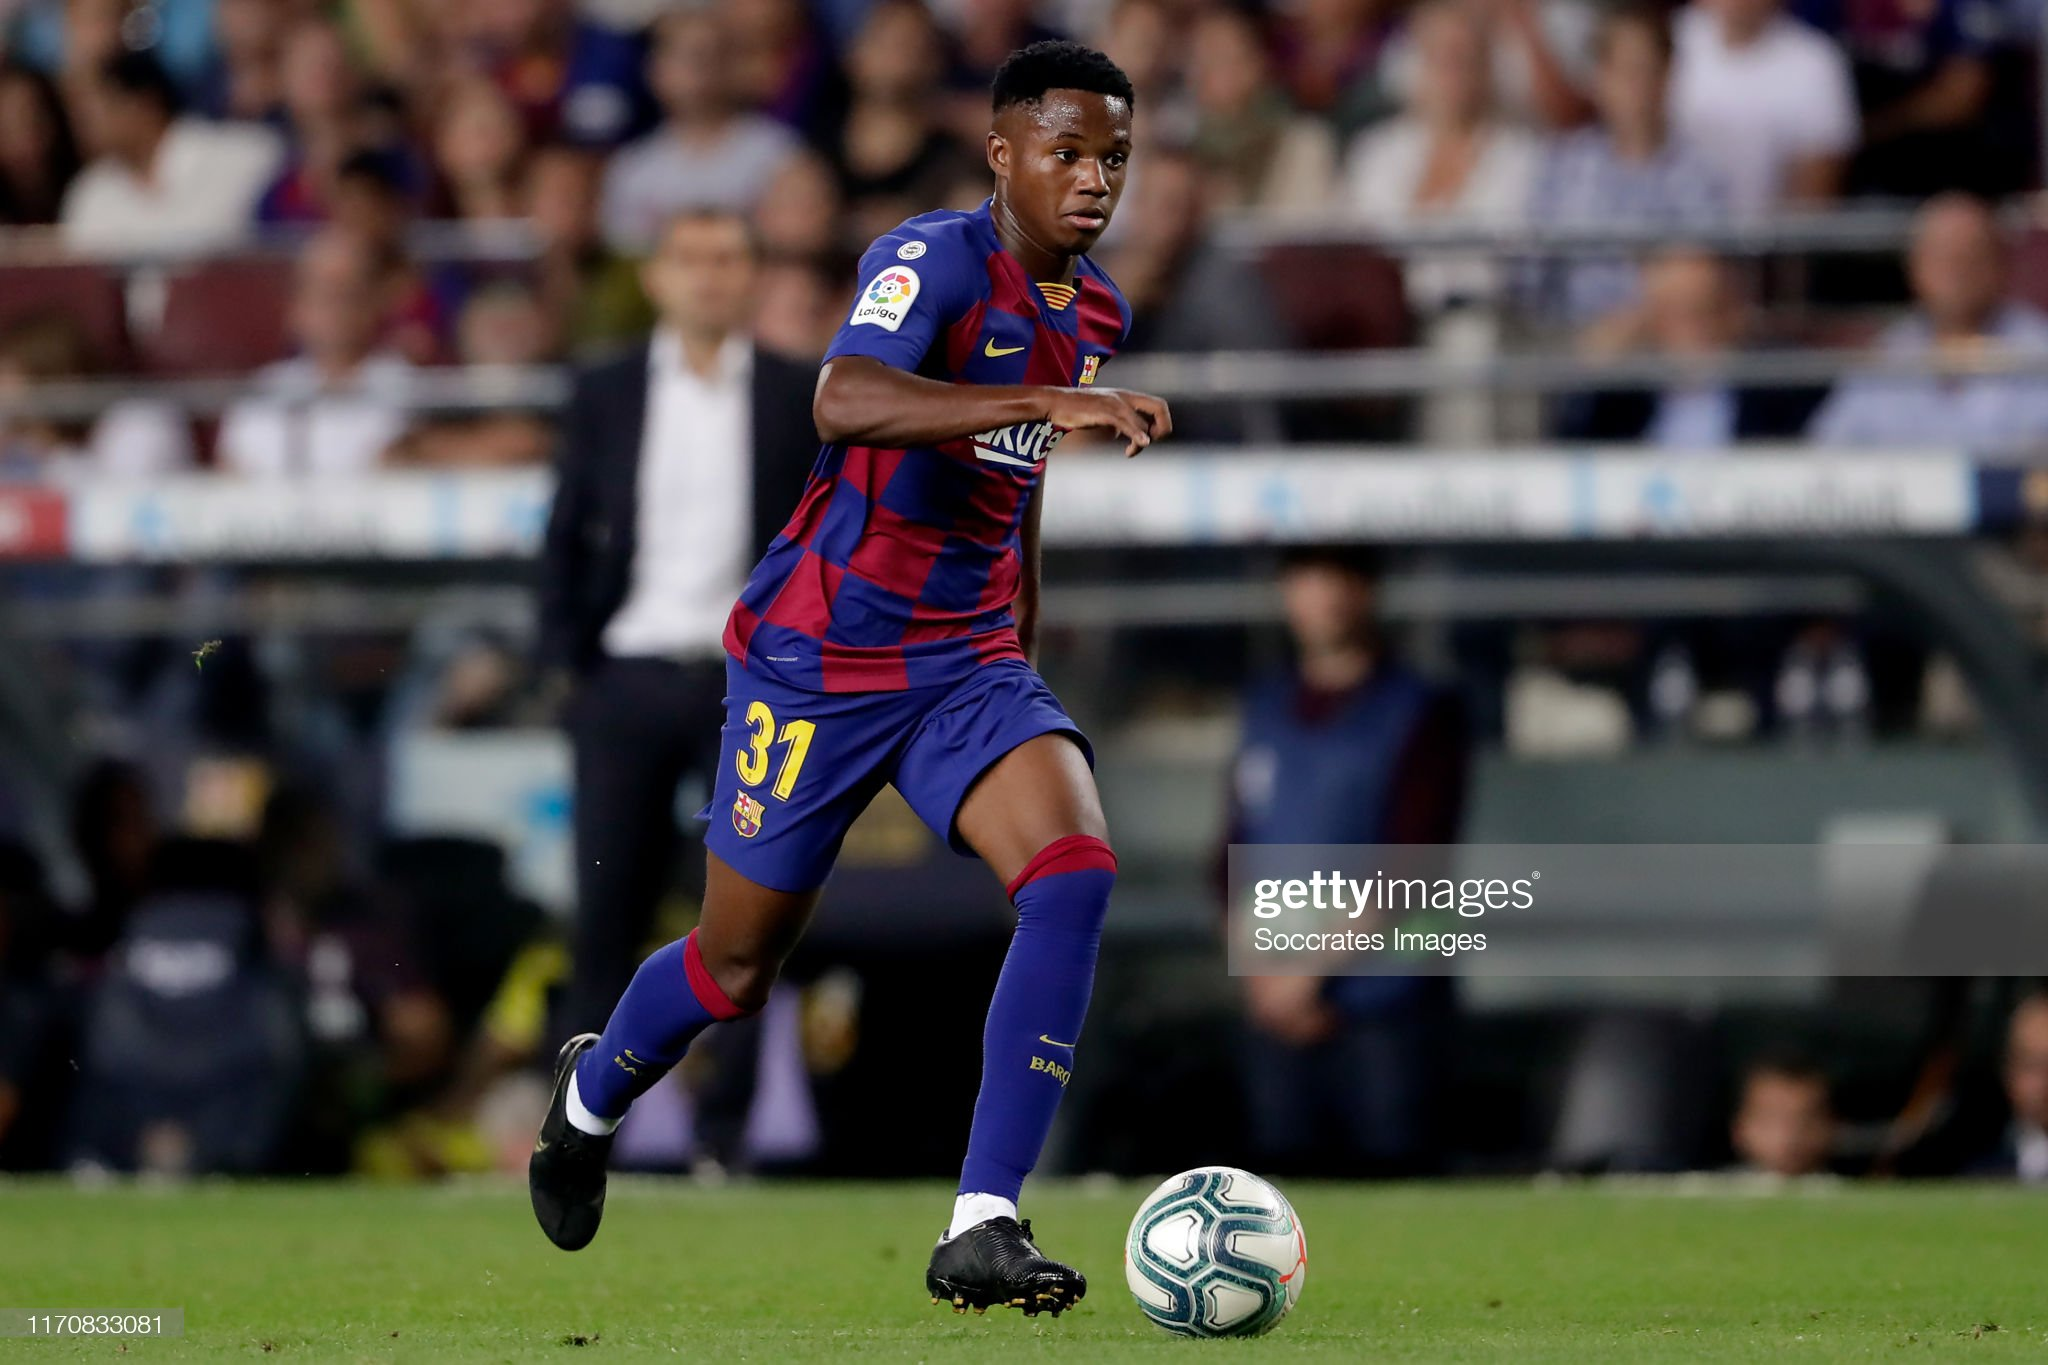 صور مباراة : برشلونة - فياريال 2-1 ( 24-09-2019 )  Ansu-fati-of-fc-barcelona-during-the-la-liga-santander-match-between-picture-id1170833081?s=2048x2048